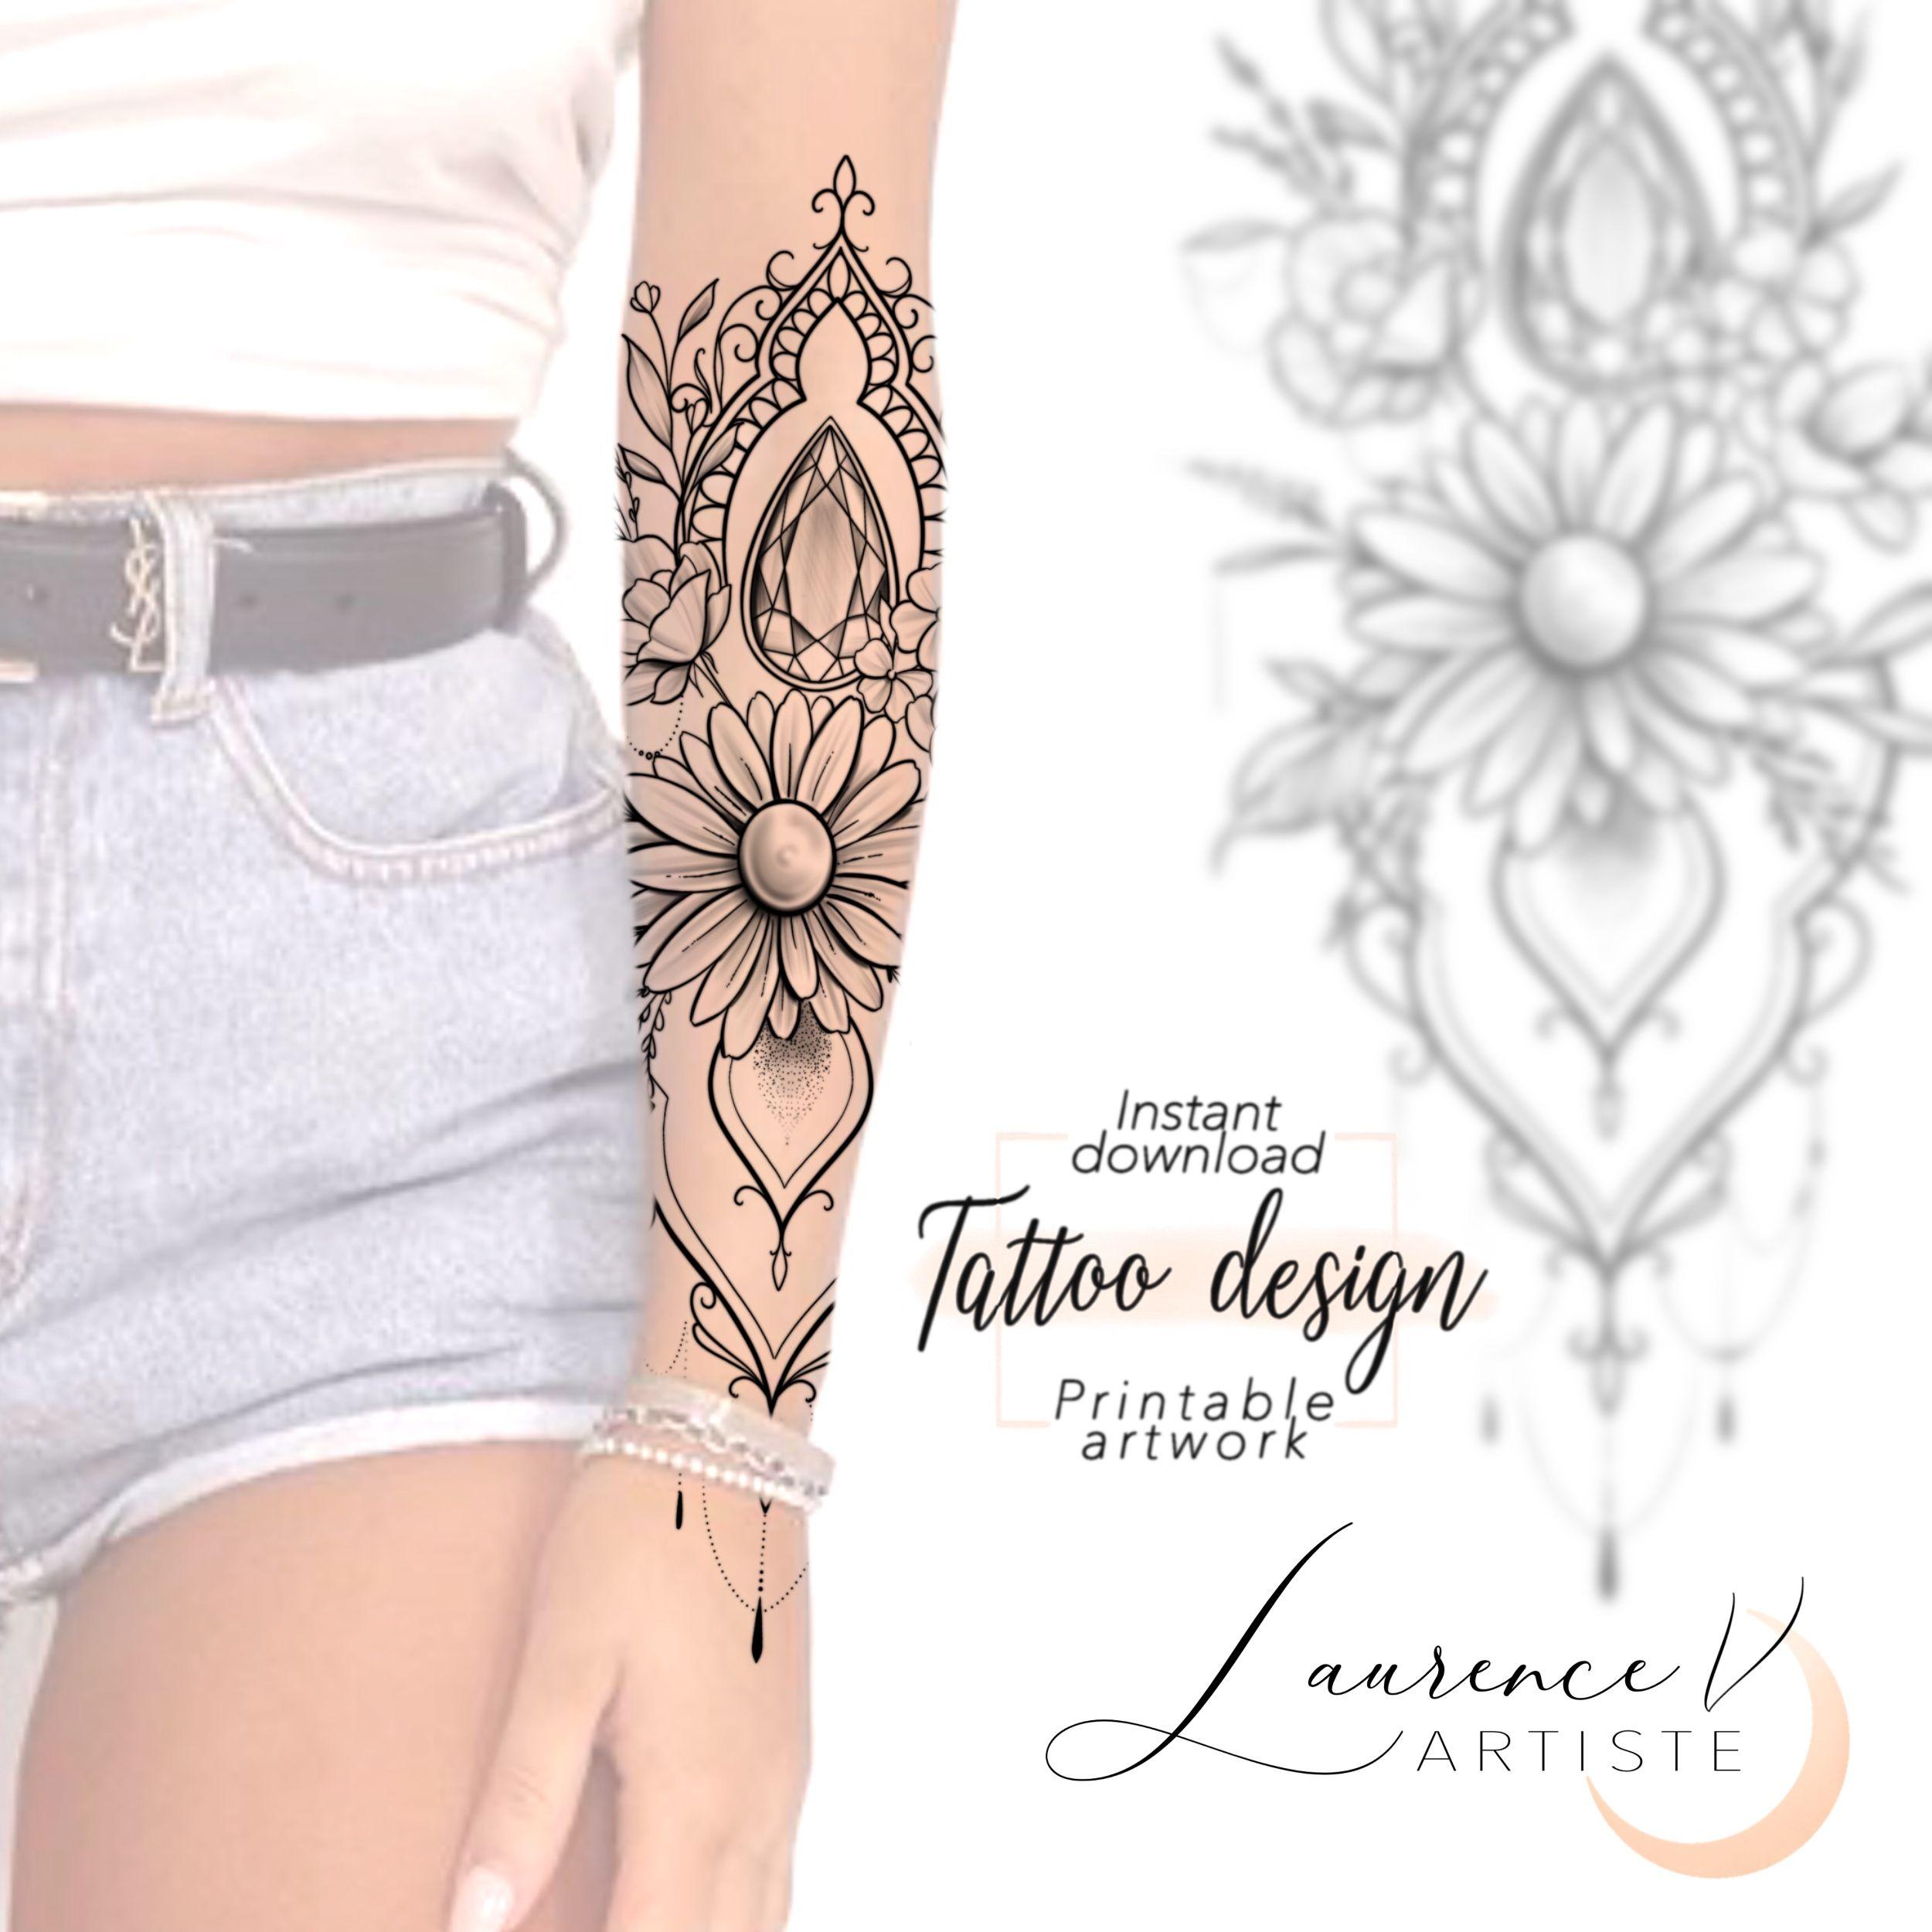 Daisyflower Half Sleeve Tattoo Design On Etsy Laurenceveillx Tattoo Designs Sleeve Tattoos Tattoo Designs For Women